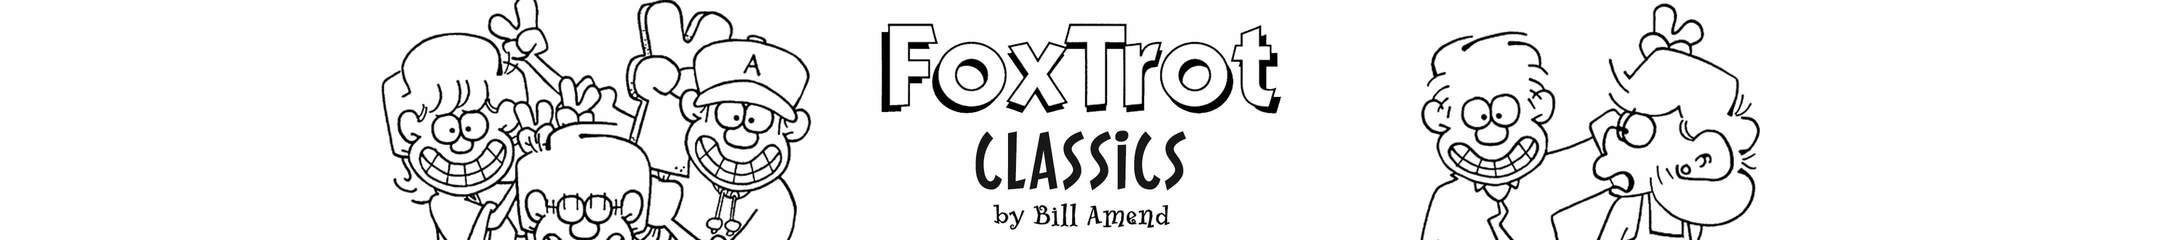 FoxTrot Classics